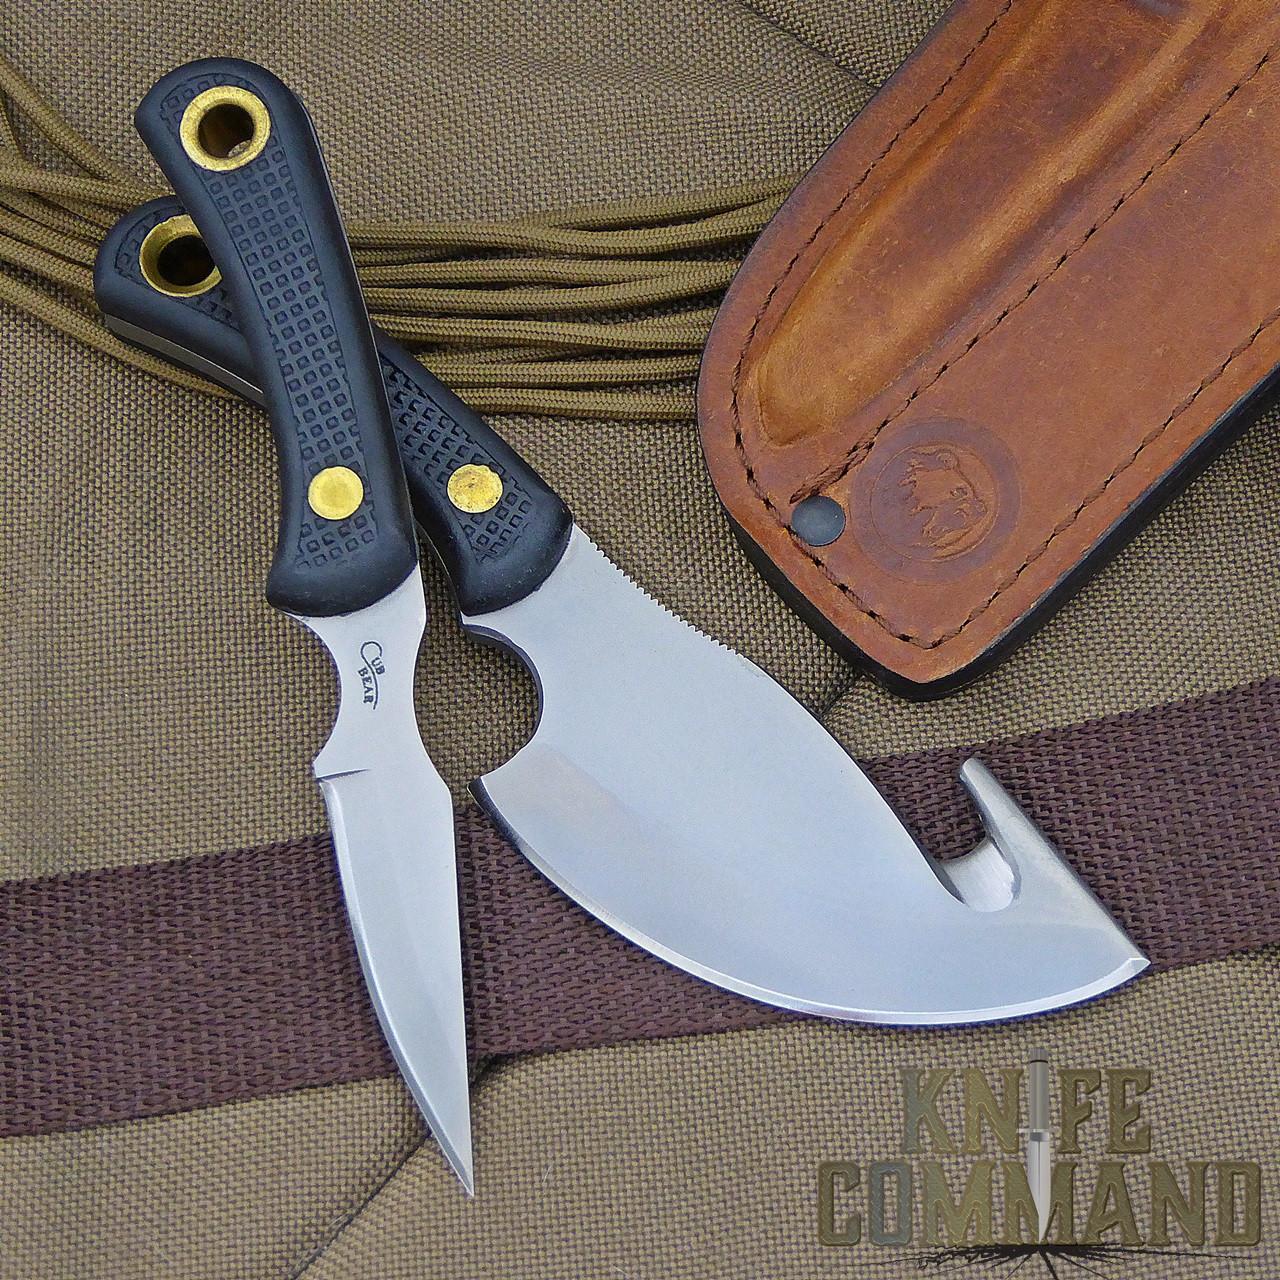 Knives of Alaska Light Hunter Suregrip Hunting Knife Combo.  Great for deer, sheep, and mountain goat.